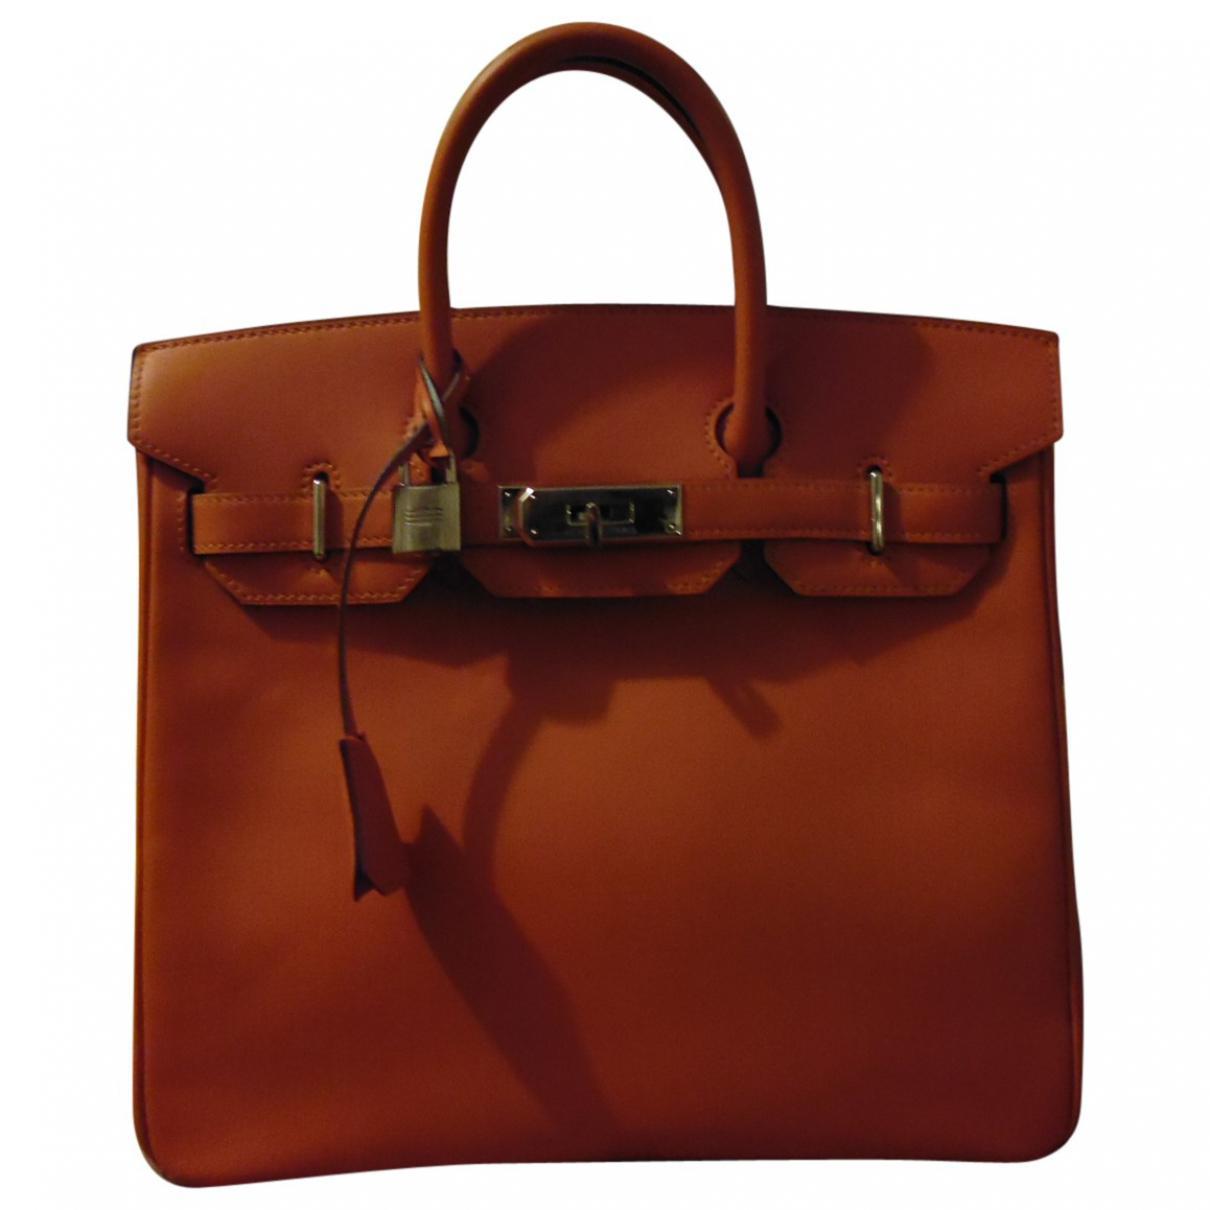 f355803c274 Lyst - Hermès Haut À Courroies Orange Leather Handbag in Orange